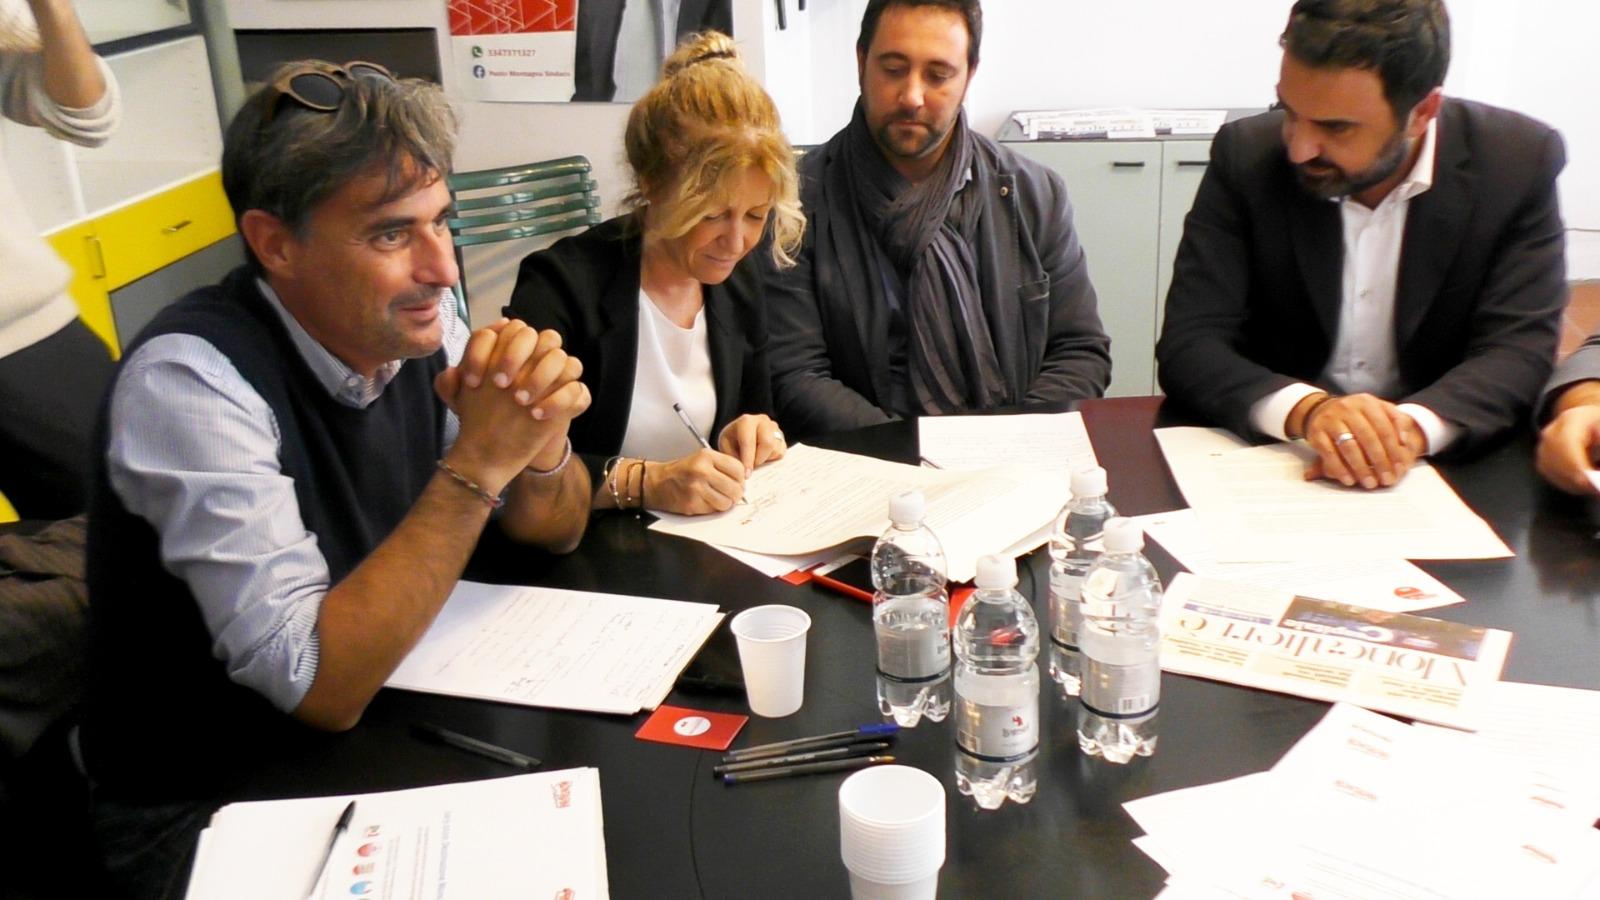 elena apollonio paolo montagna demos moncalieri elezioni 2020 piemonte